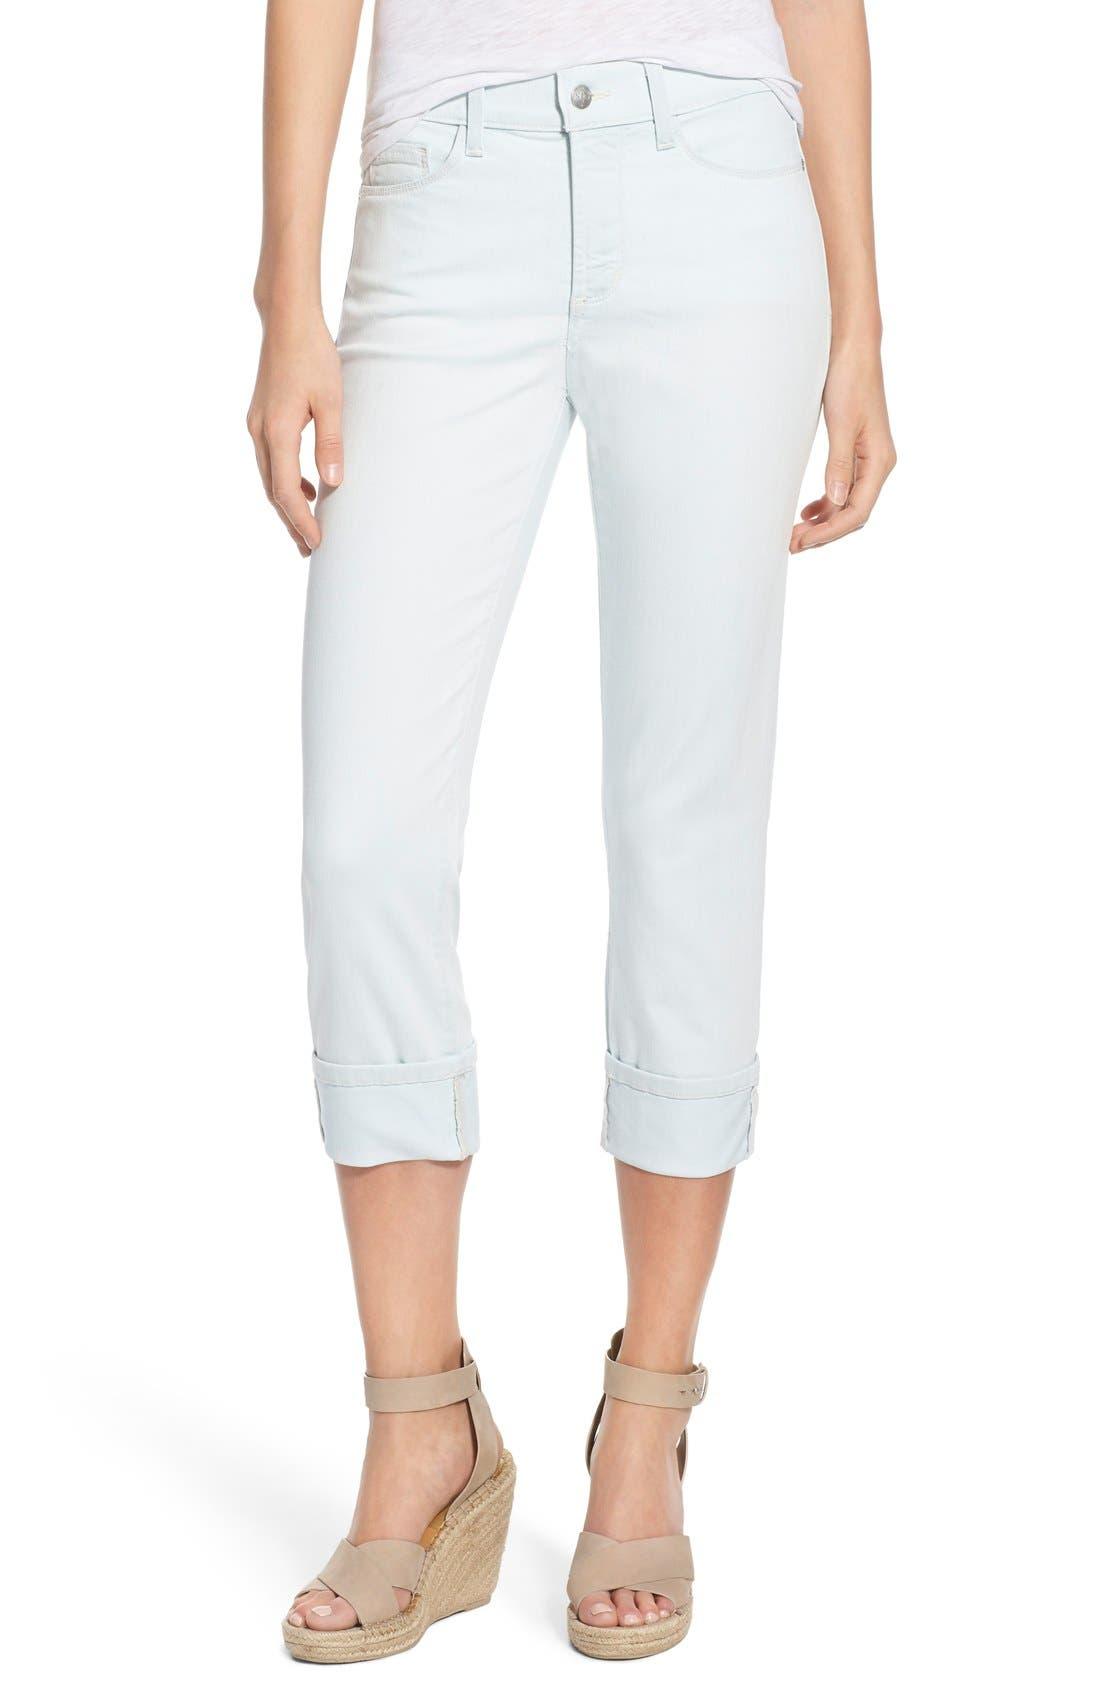 'Dayla' Colored Wide Cuff Capri Jeans,                             Main thumbnail 13, color,